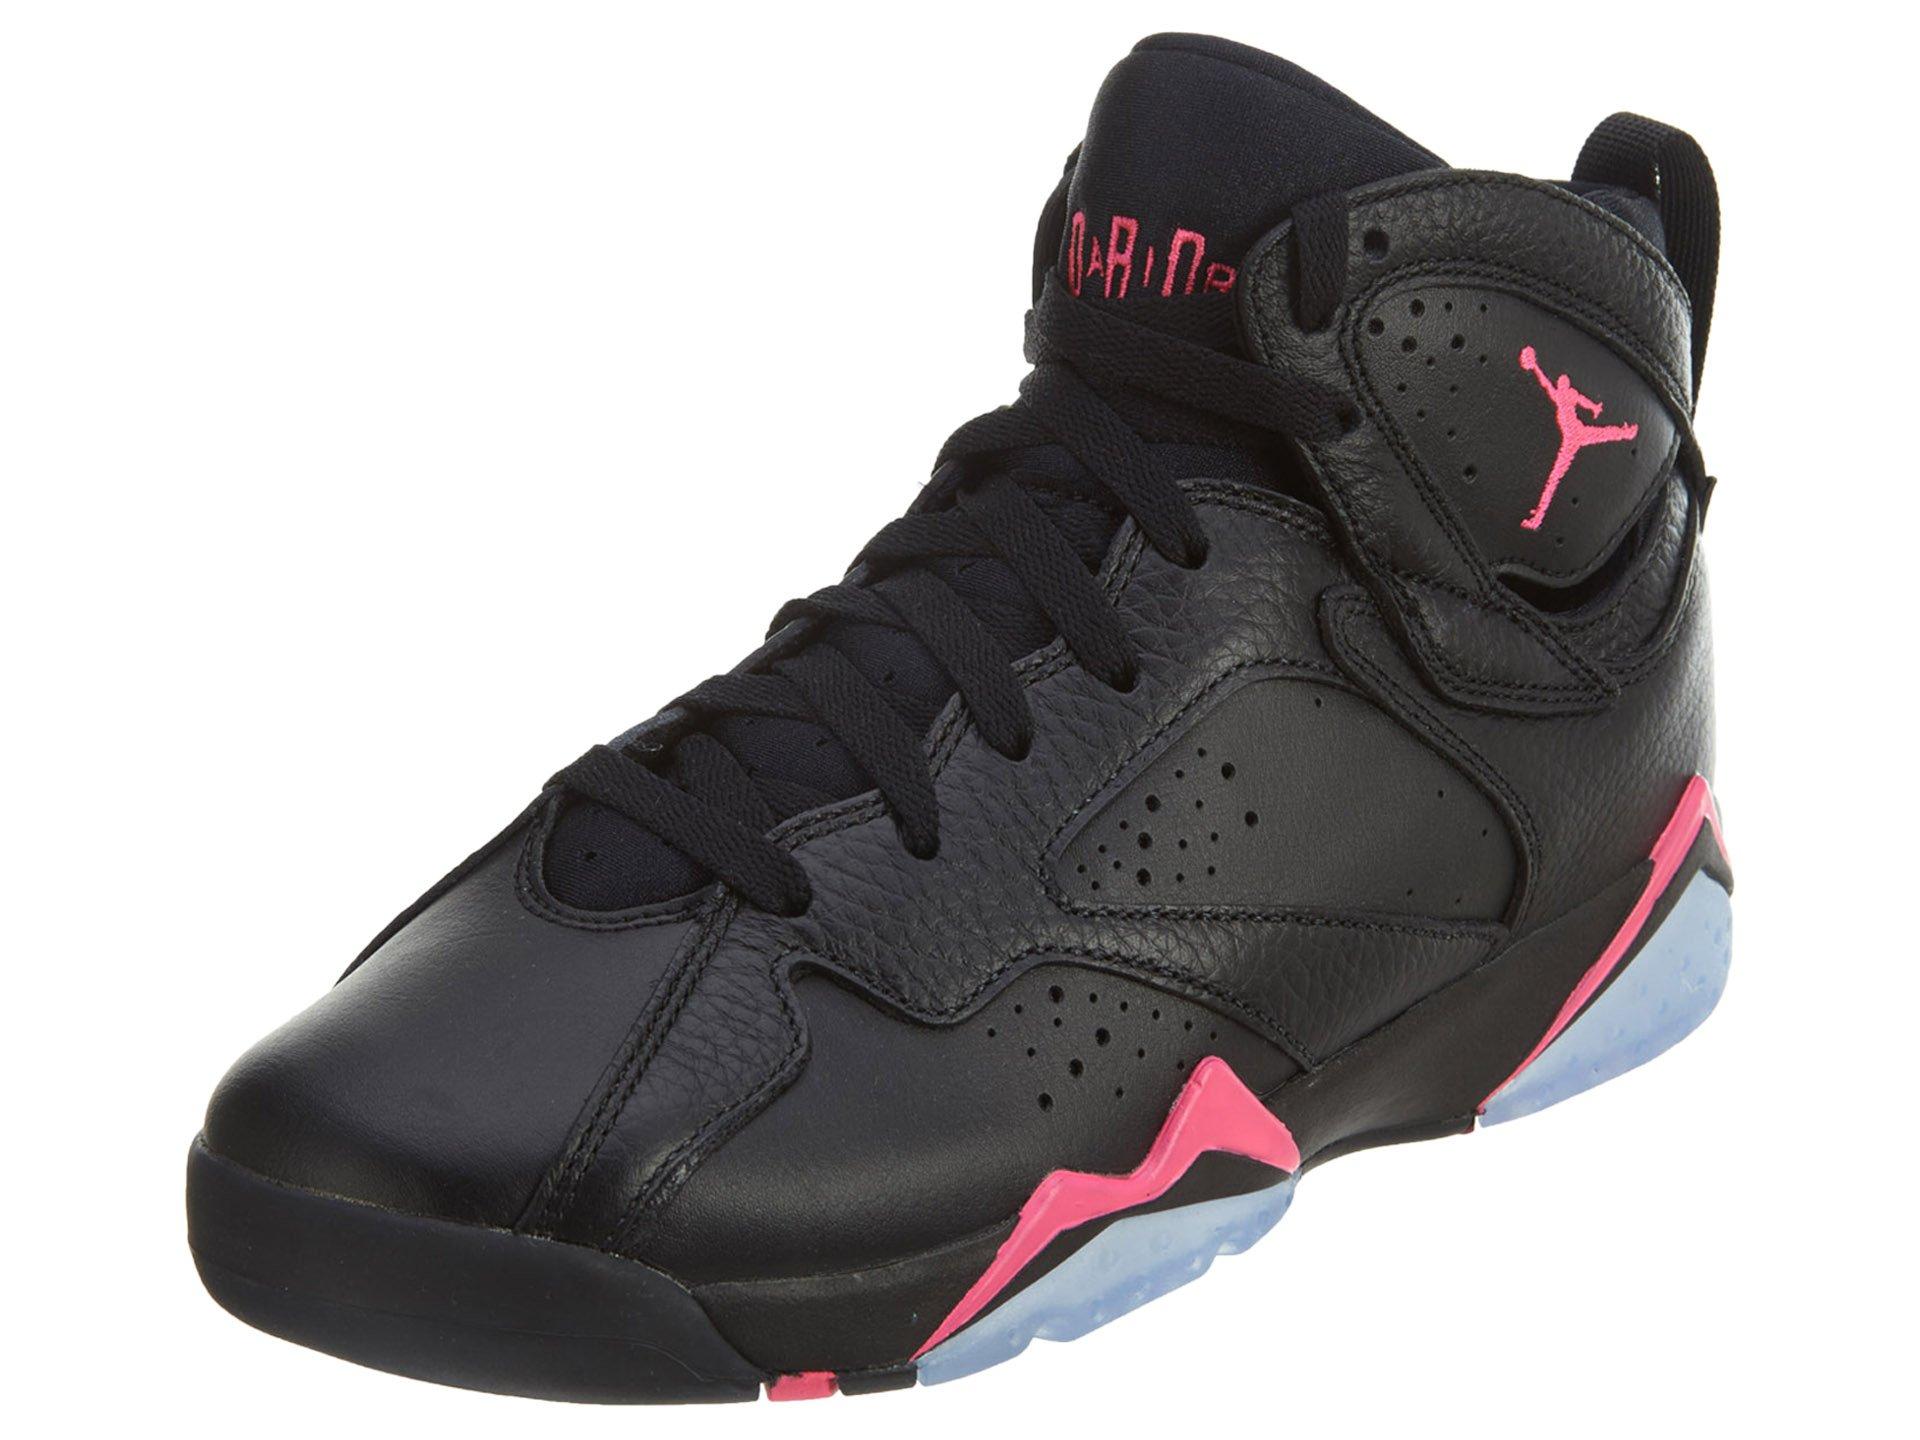 Jordan Nike Kids 7 Retro GG Black/HyperPink/Hyper Pink Basketball Shoe 4 Kids US by Jordan